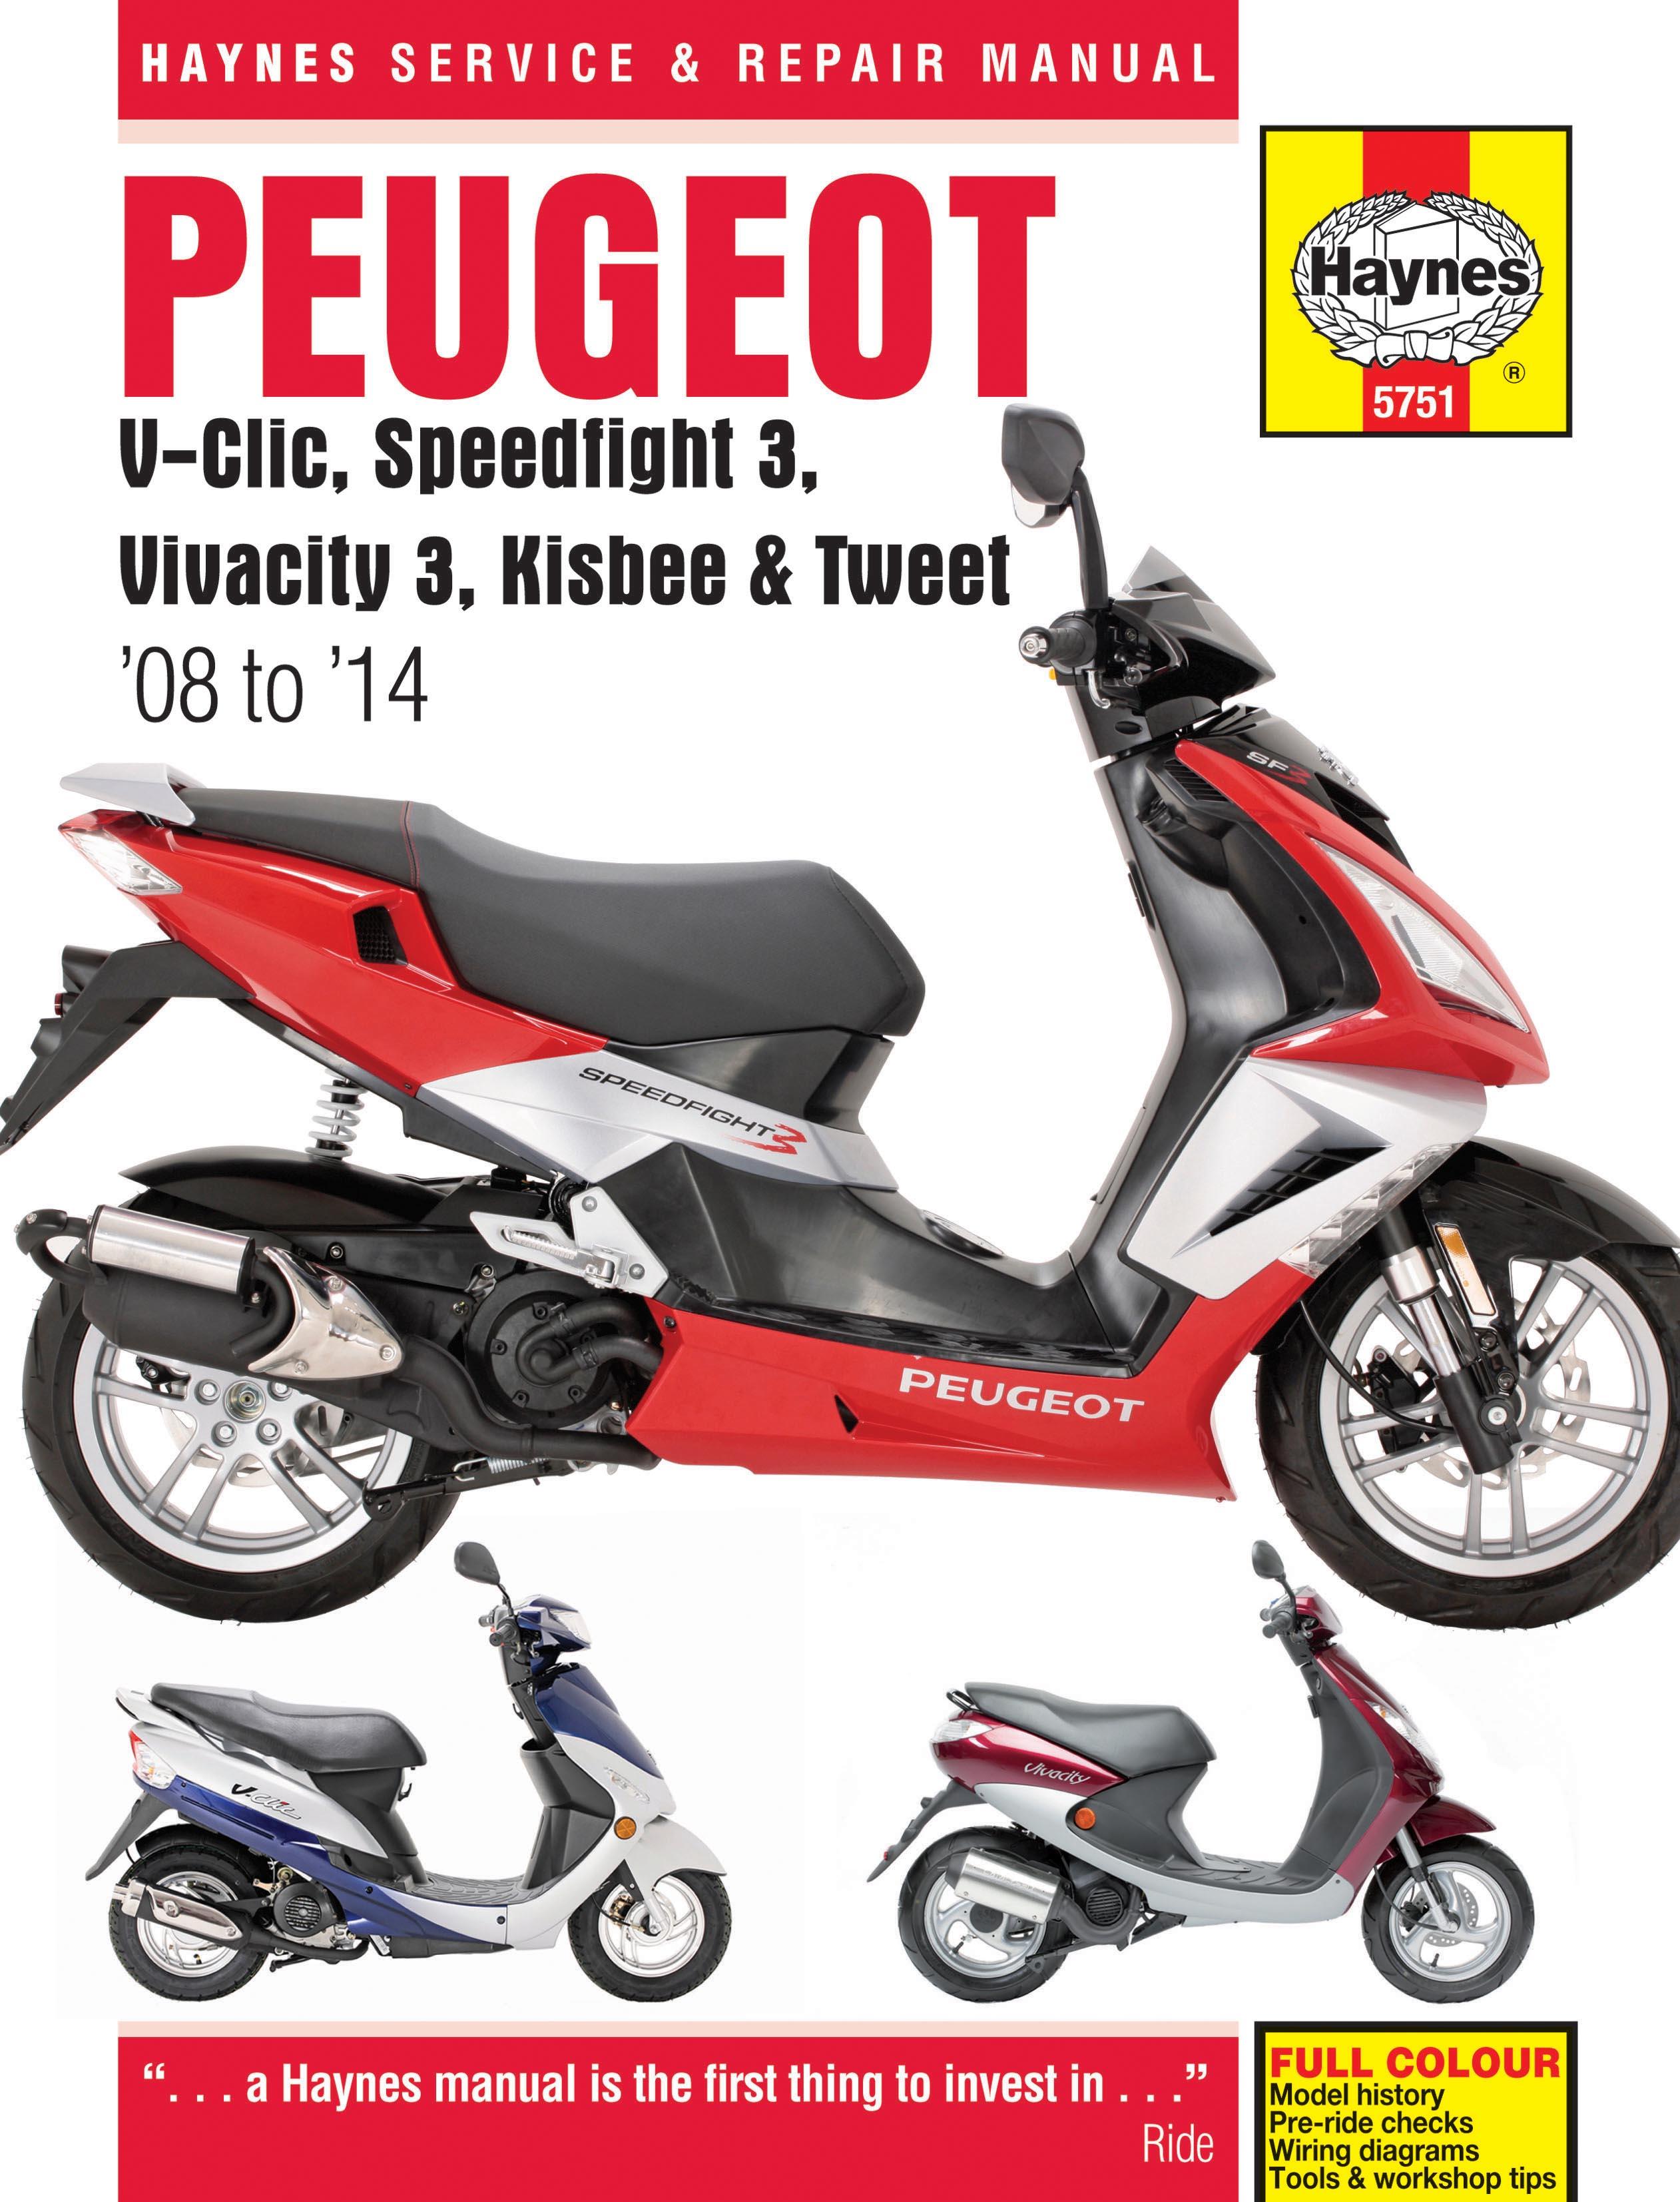 peugeot v clic fuse box peugeot v-clic, speedfight 3, vivacity 3, kisbee & tweet ... #11